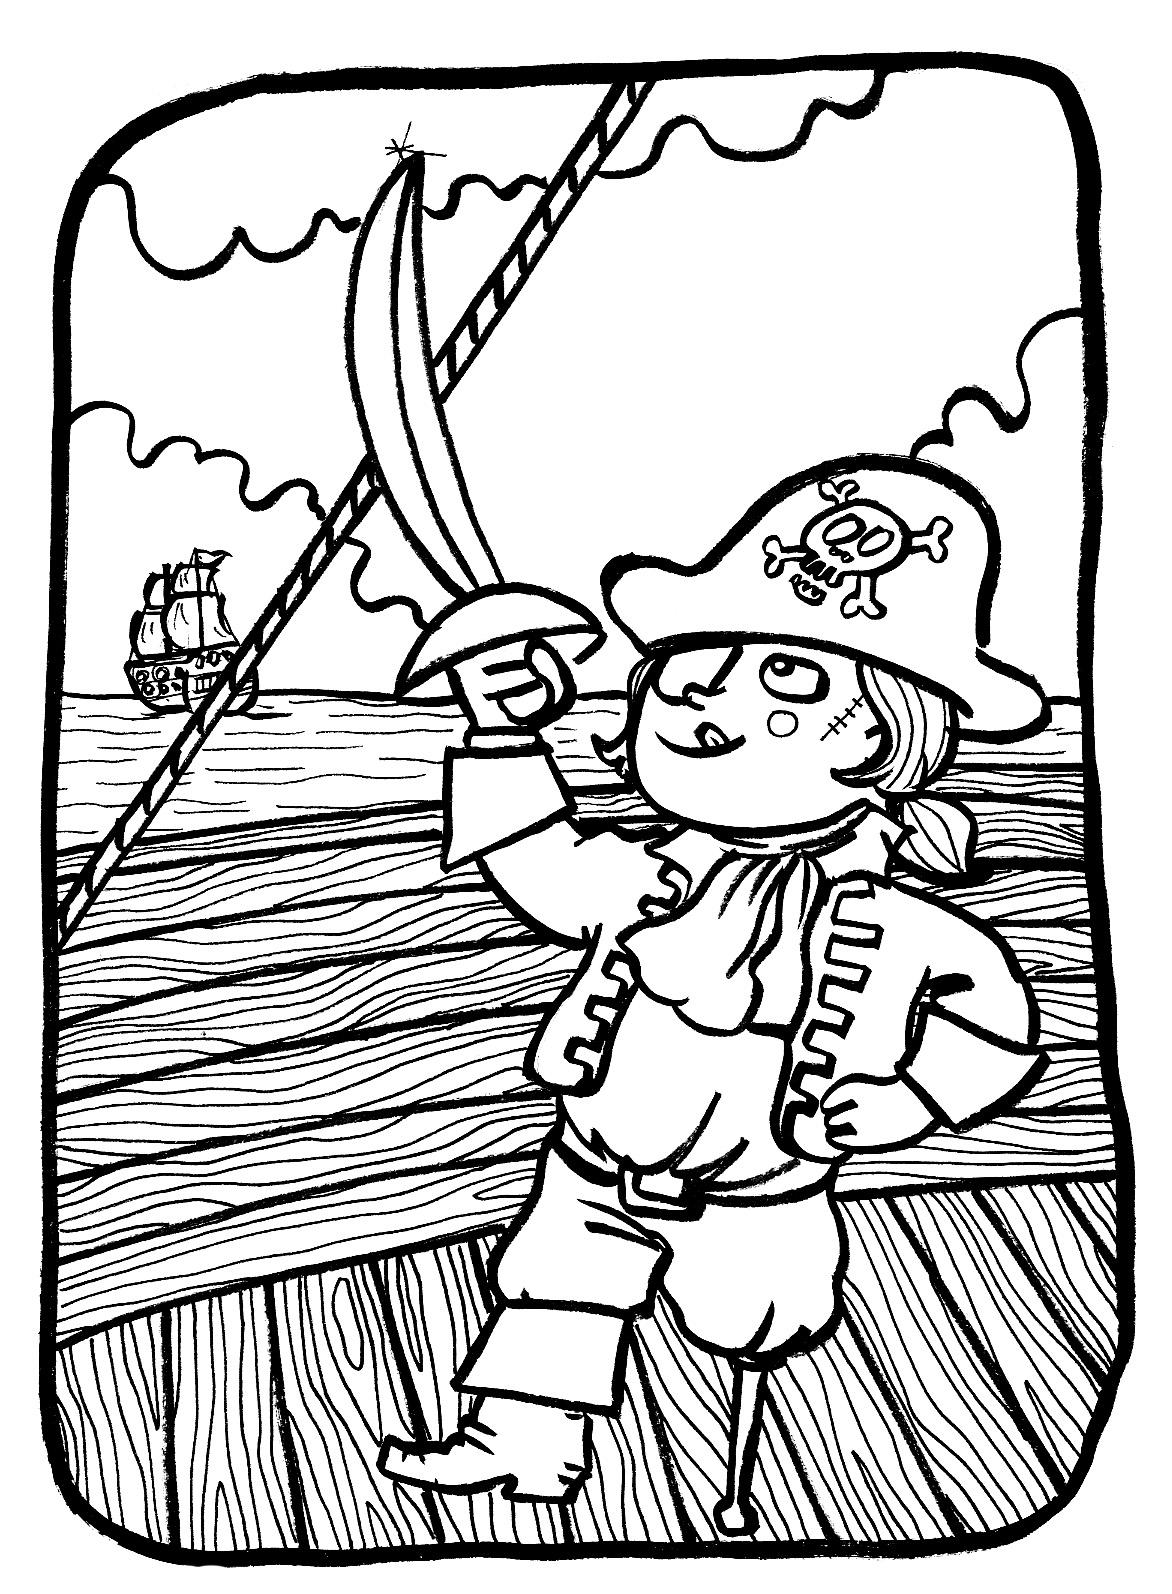 Marion de castillon juillet 2011 - Dessin pirates ...